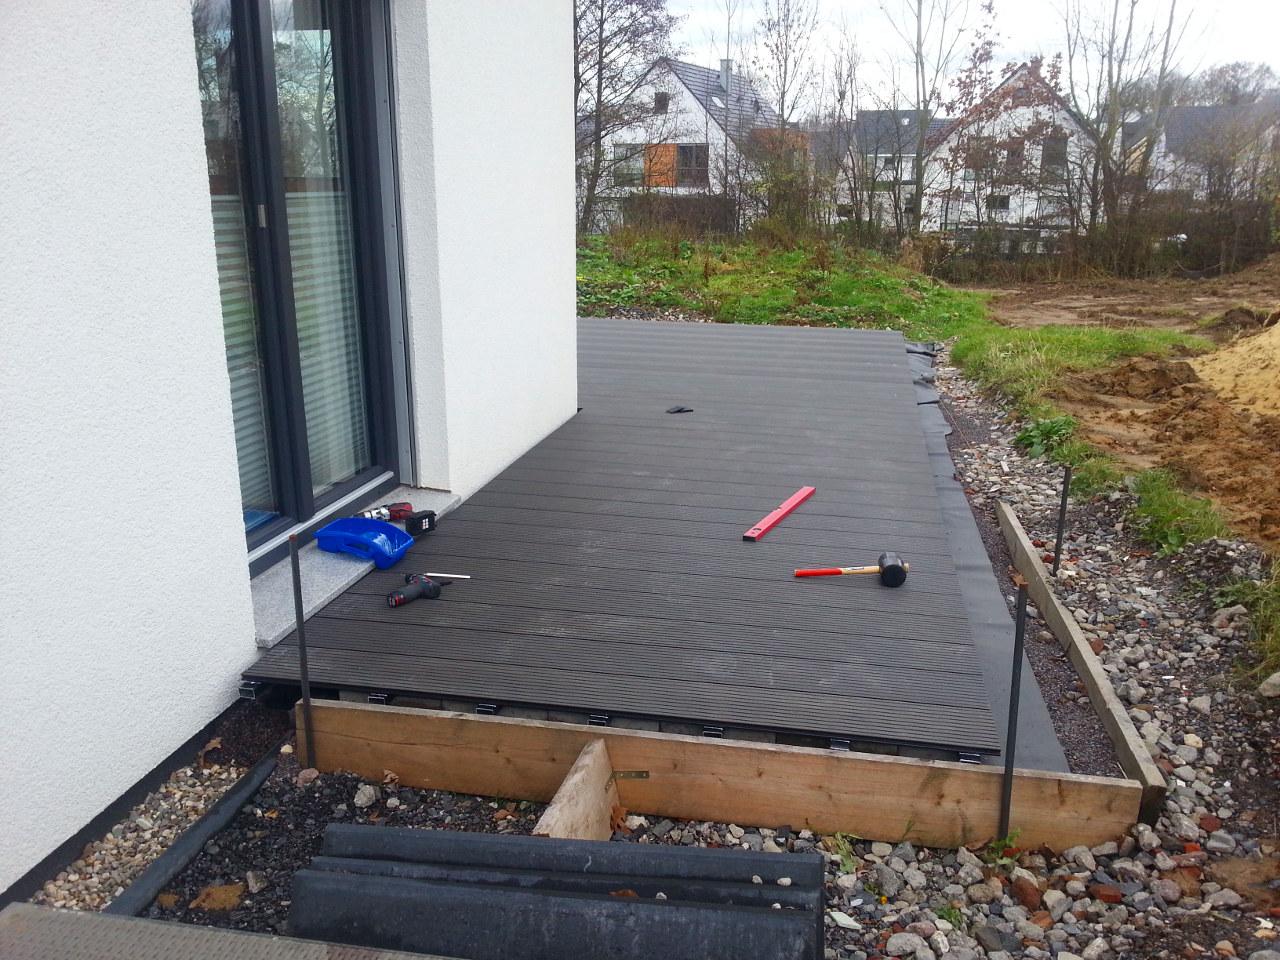 terrasse in eigenregie teil 2 our home is our castle. Black Bedroom Furniture Sets. Home Design Ideas